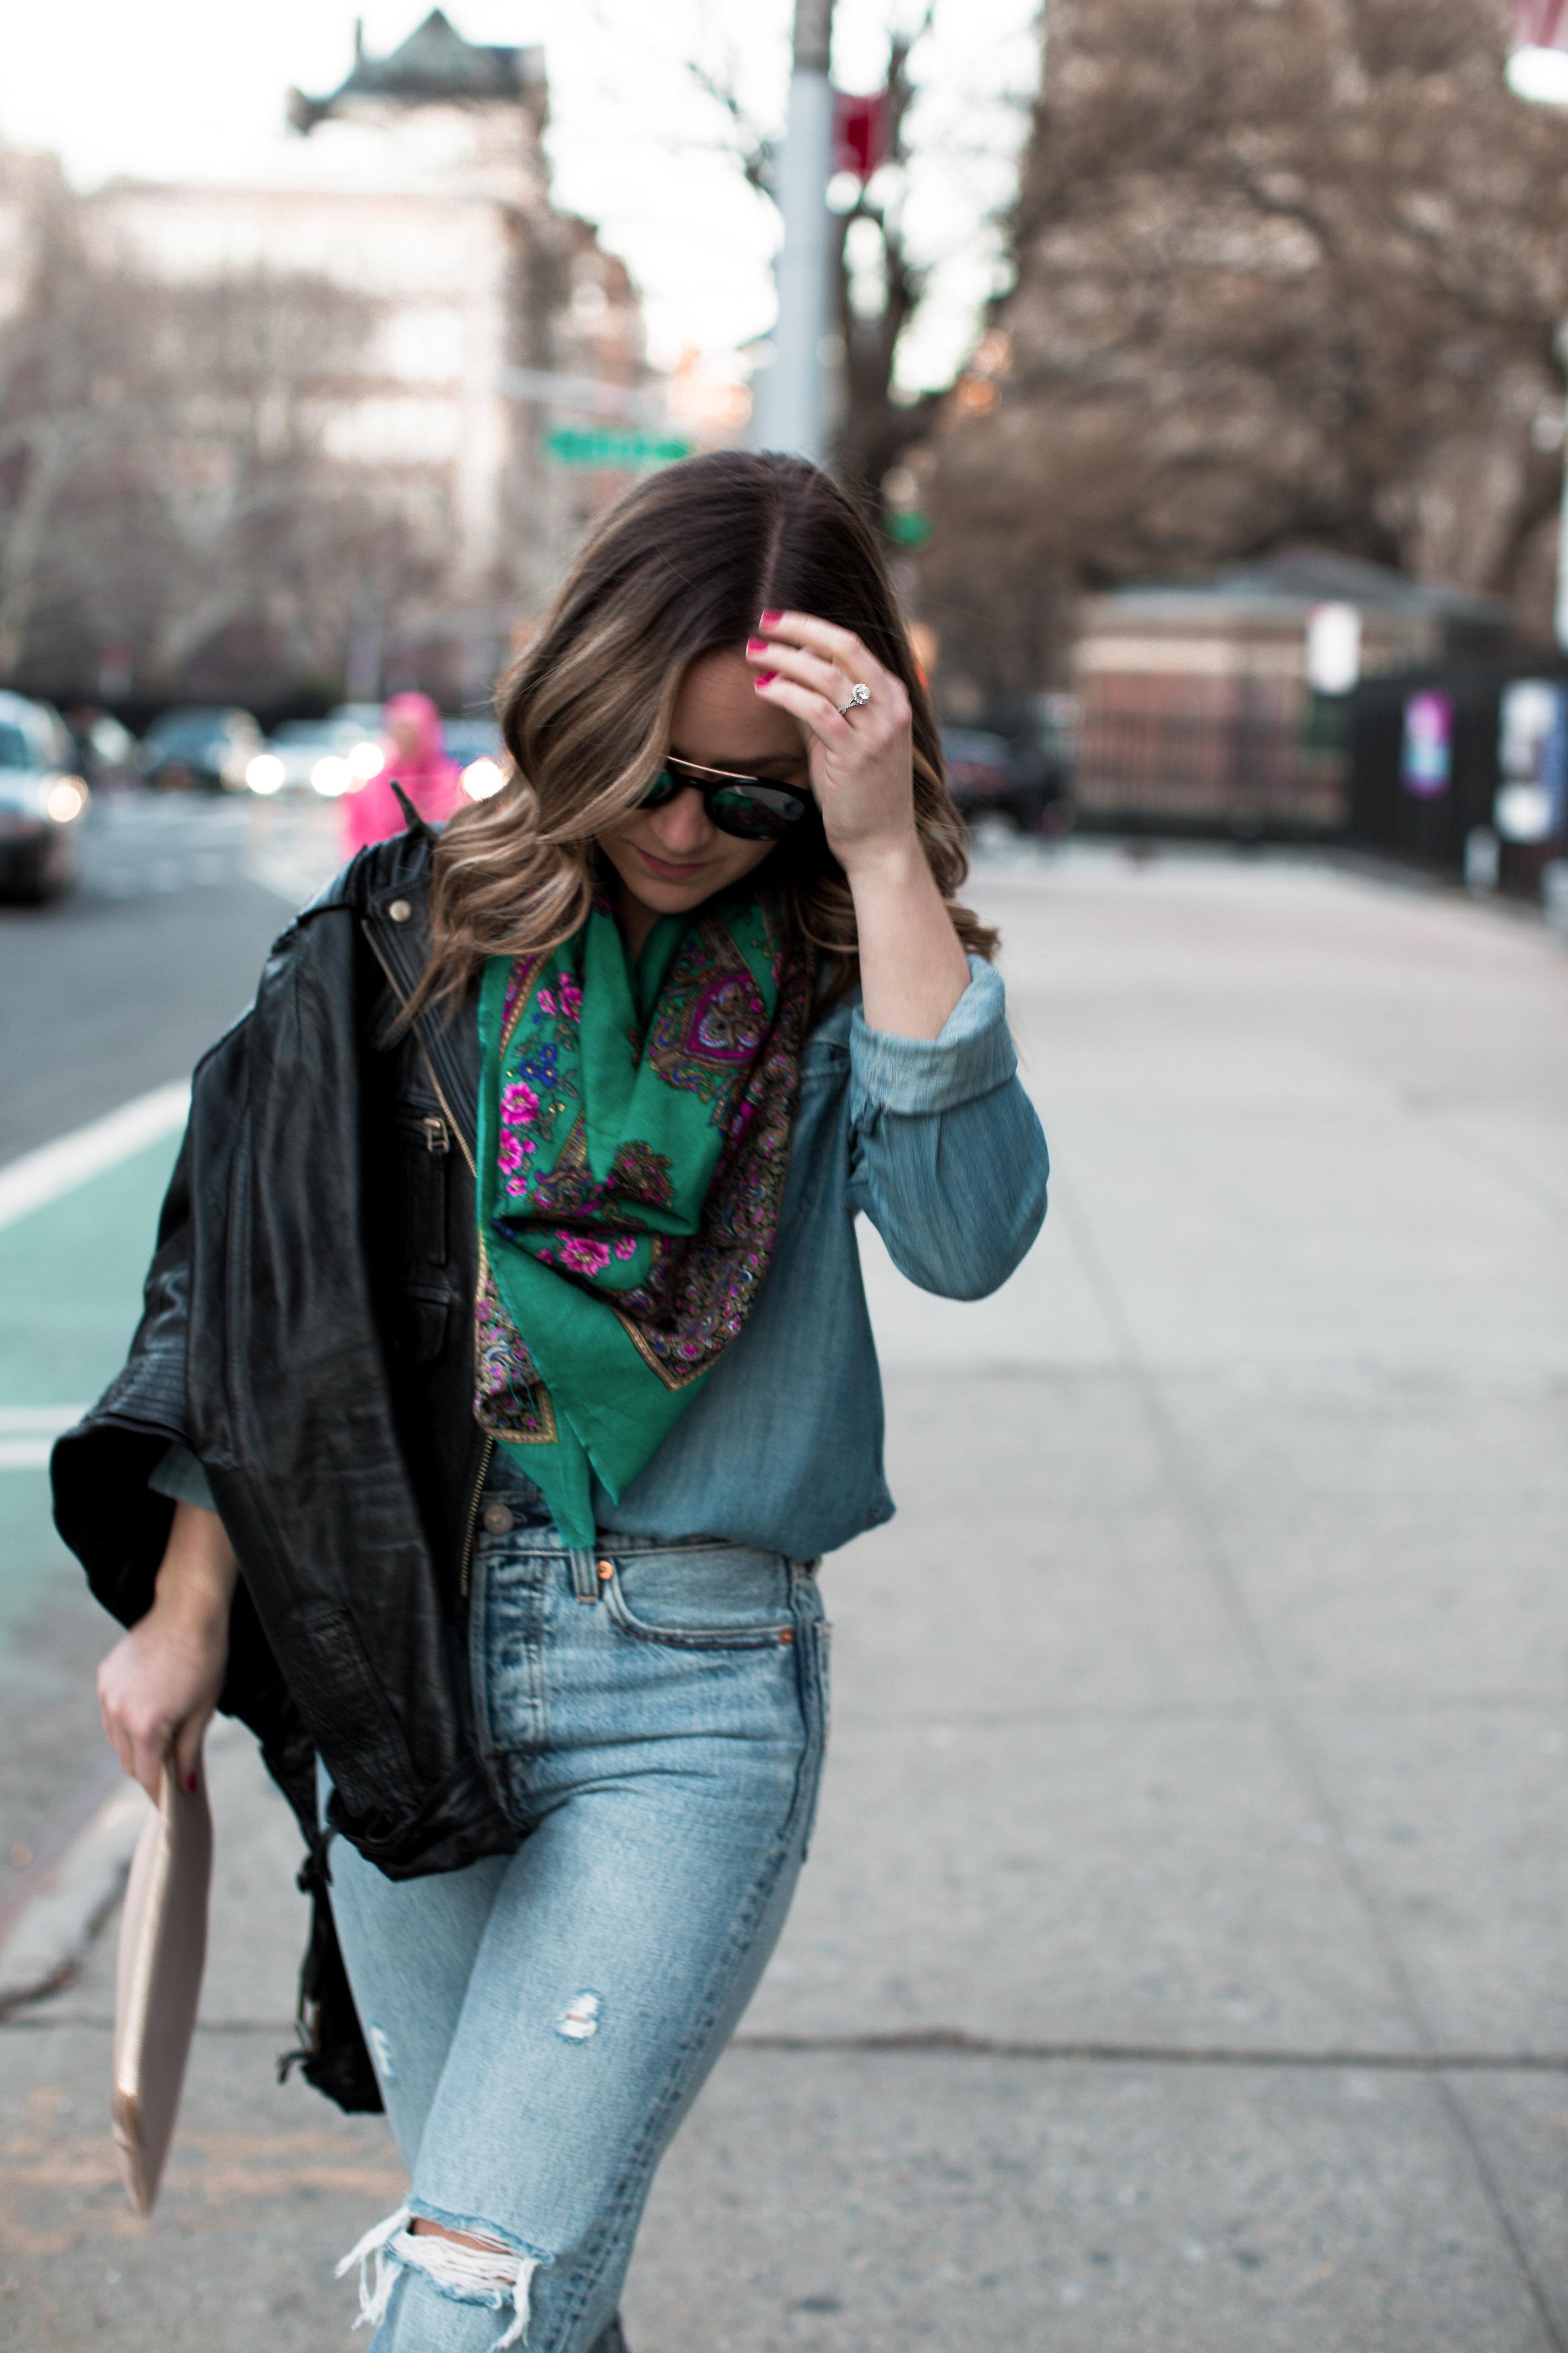 fizz-fade-green-vintage-scarf-5.jpg